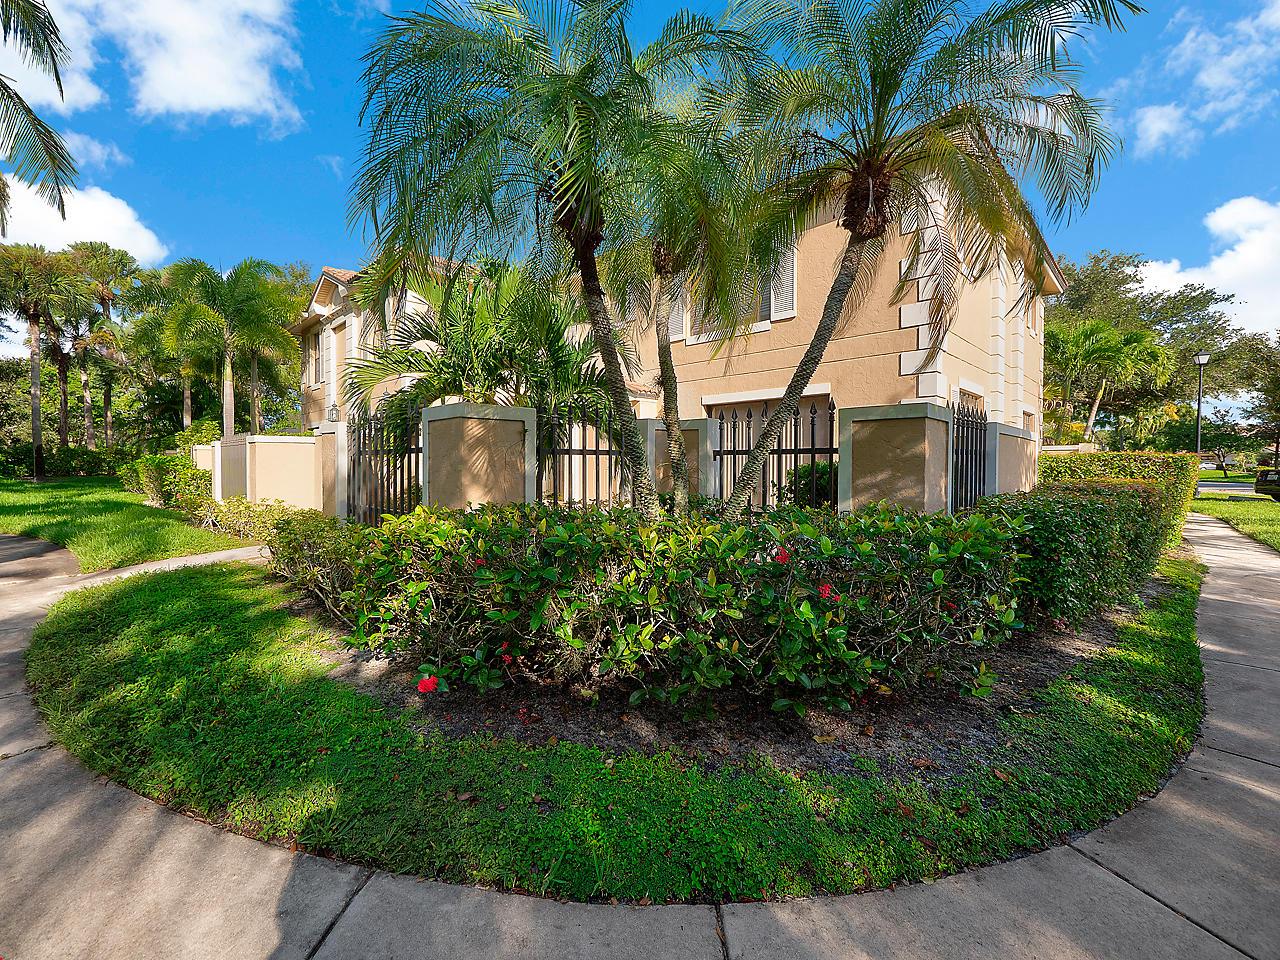 353 Prestwick Circle #3 - 33418 - FL - Palm Beach Gardens